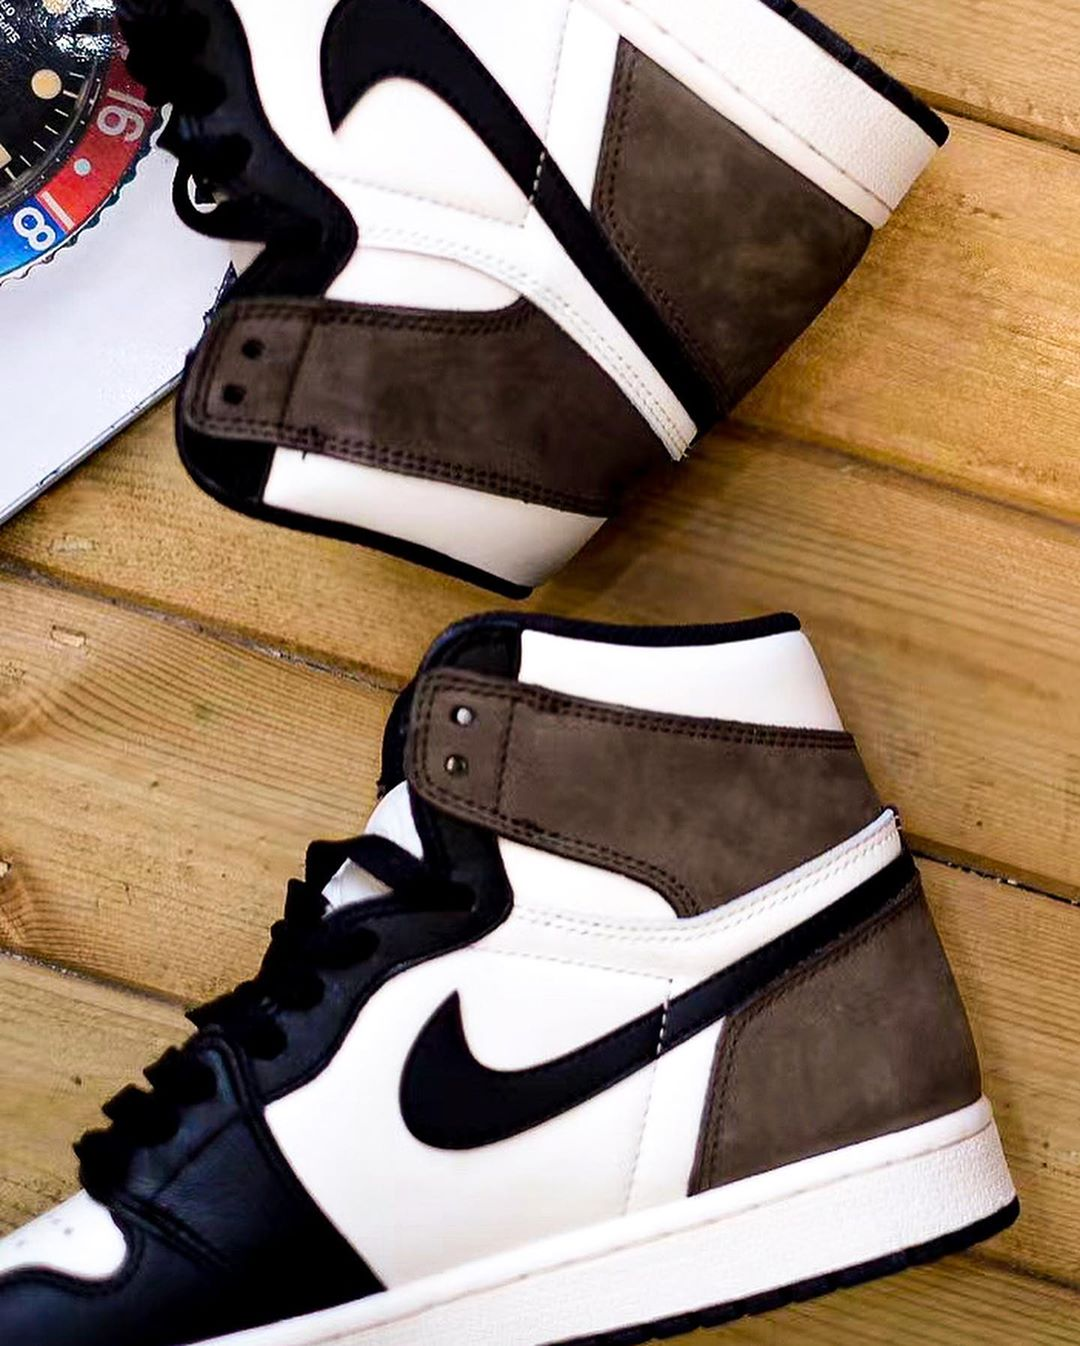 Air Jordan 1 OG Dark Mocha 555088-105